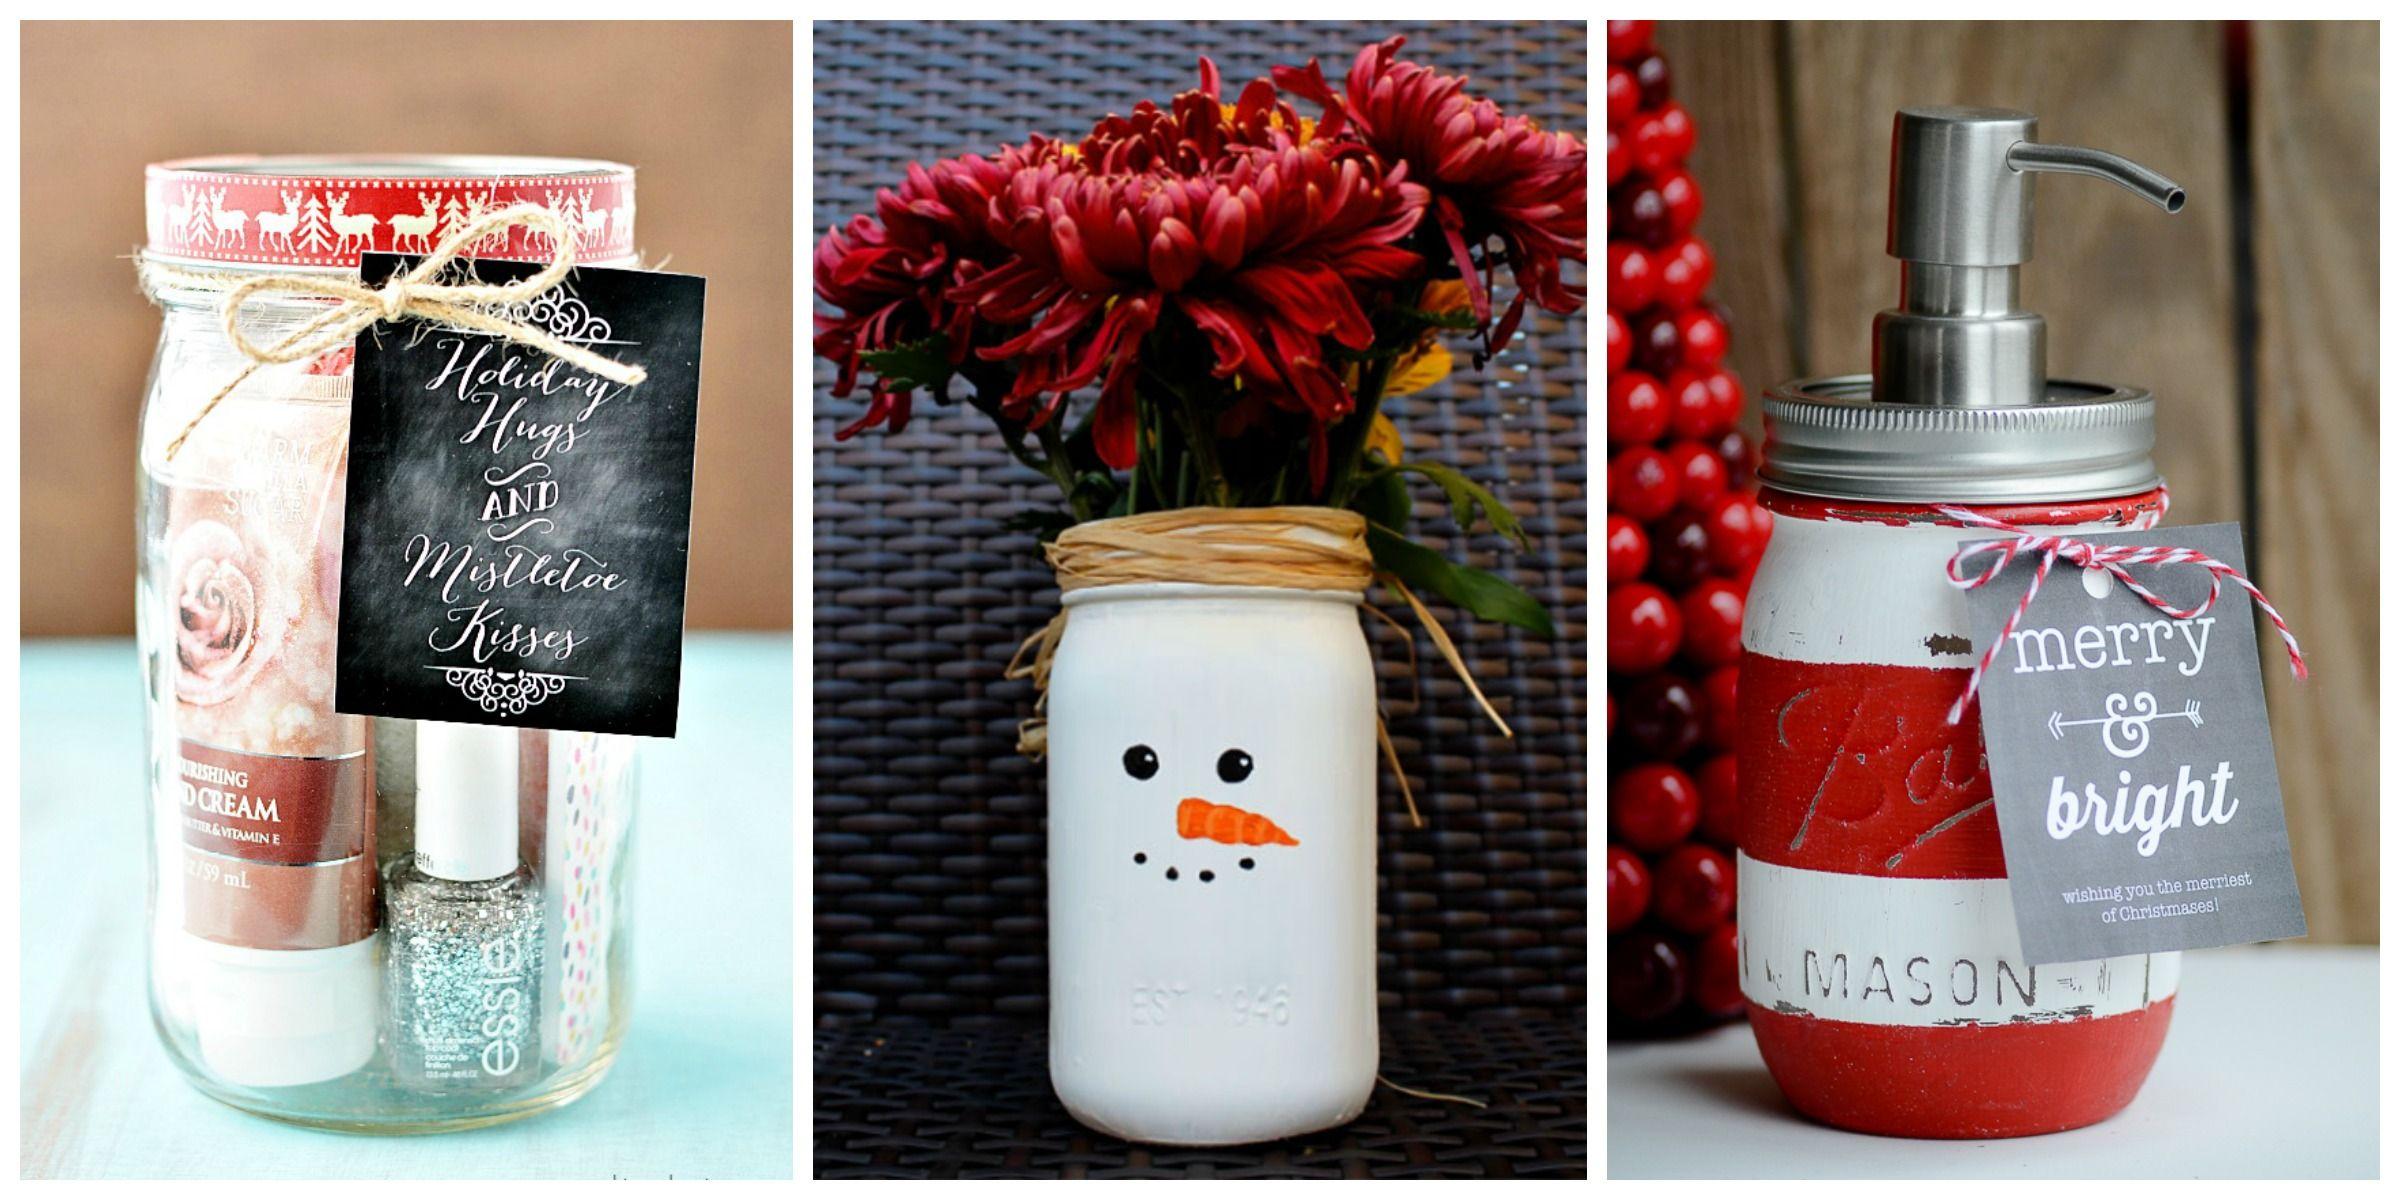 25 DIY Mason Jar Gift Ideas - Homemade Christmas Gifts in Mason Jars